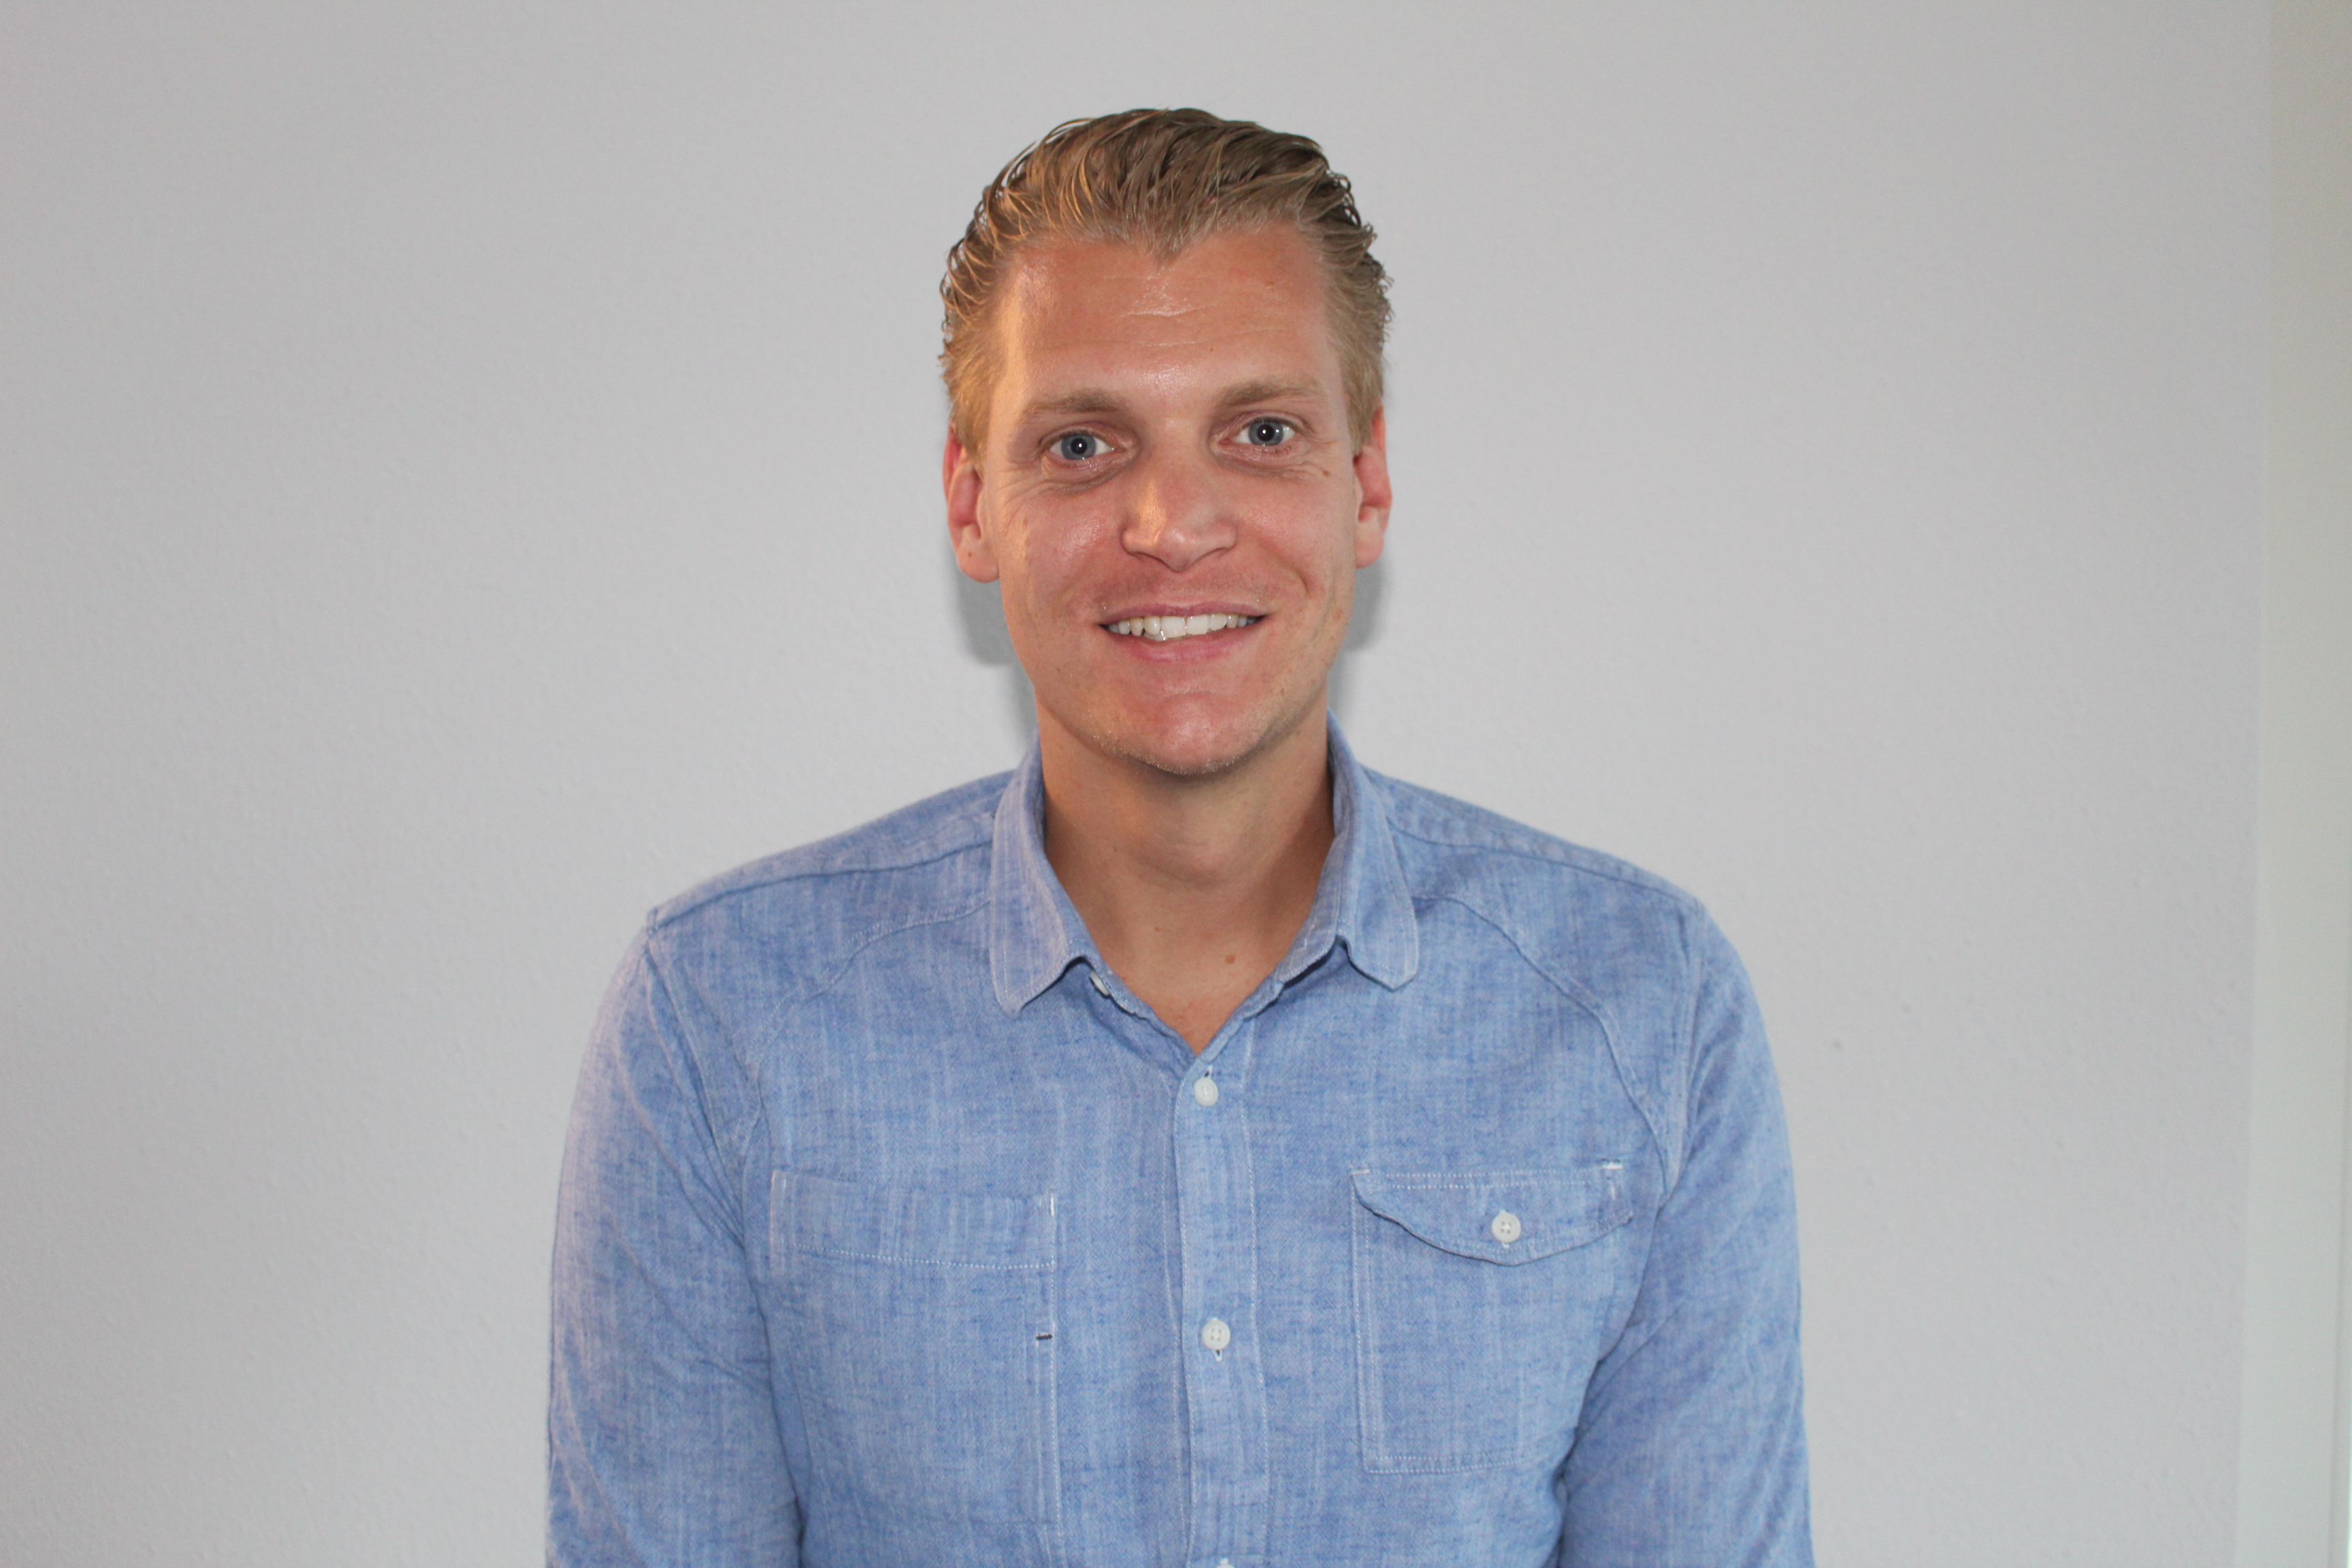 Matthijs van der Linden